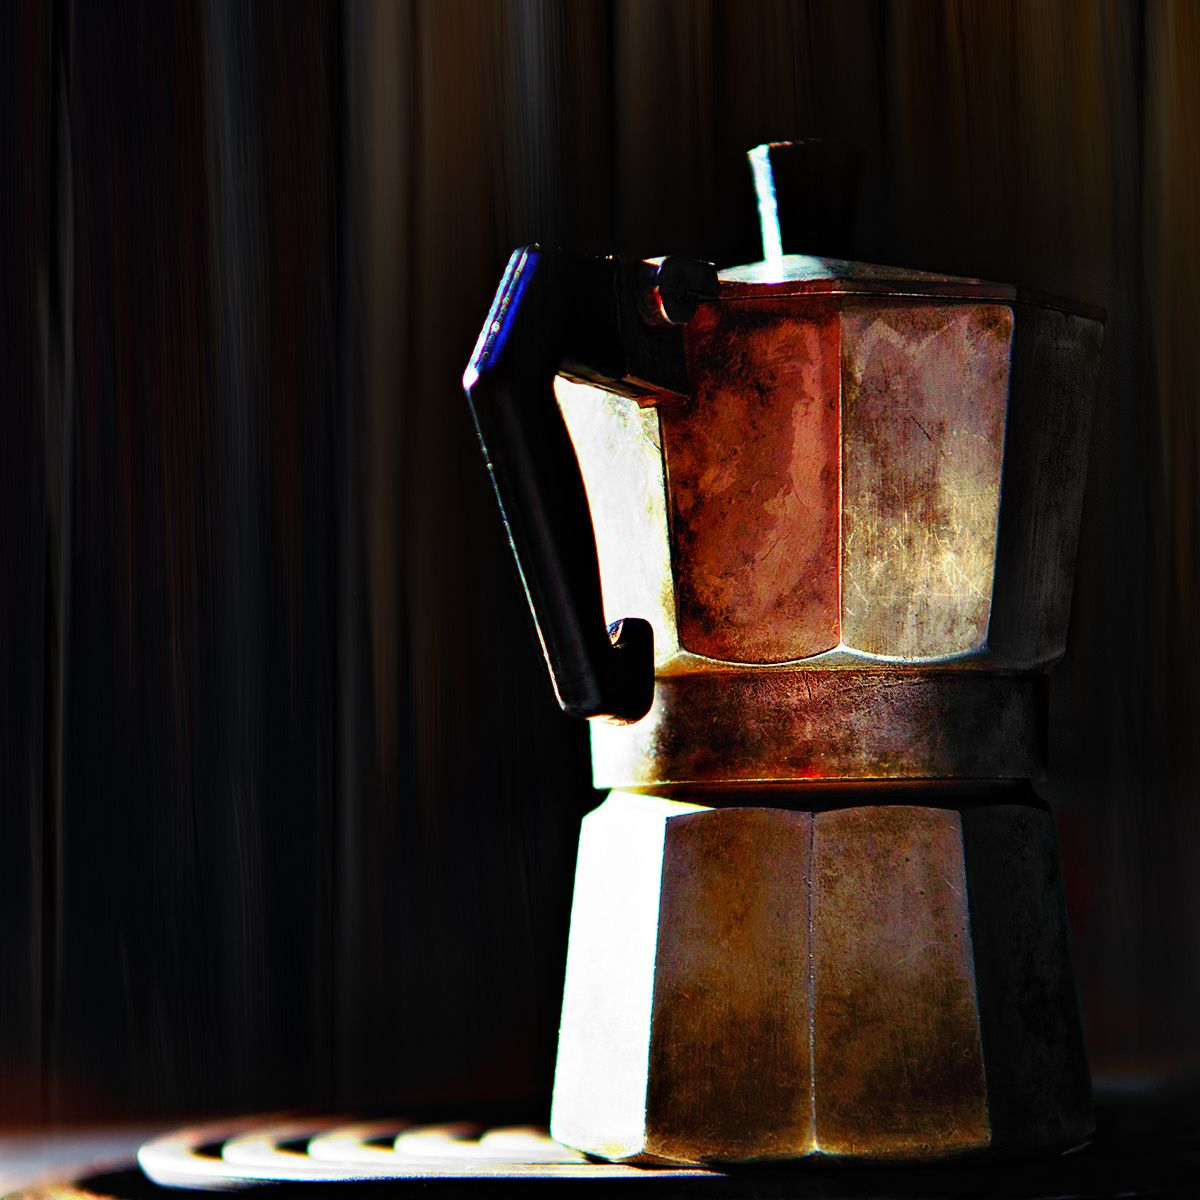 14+ Where to buy good folks coffee ideas